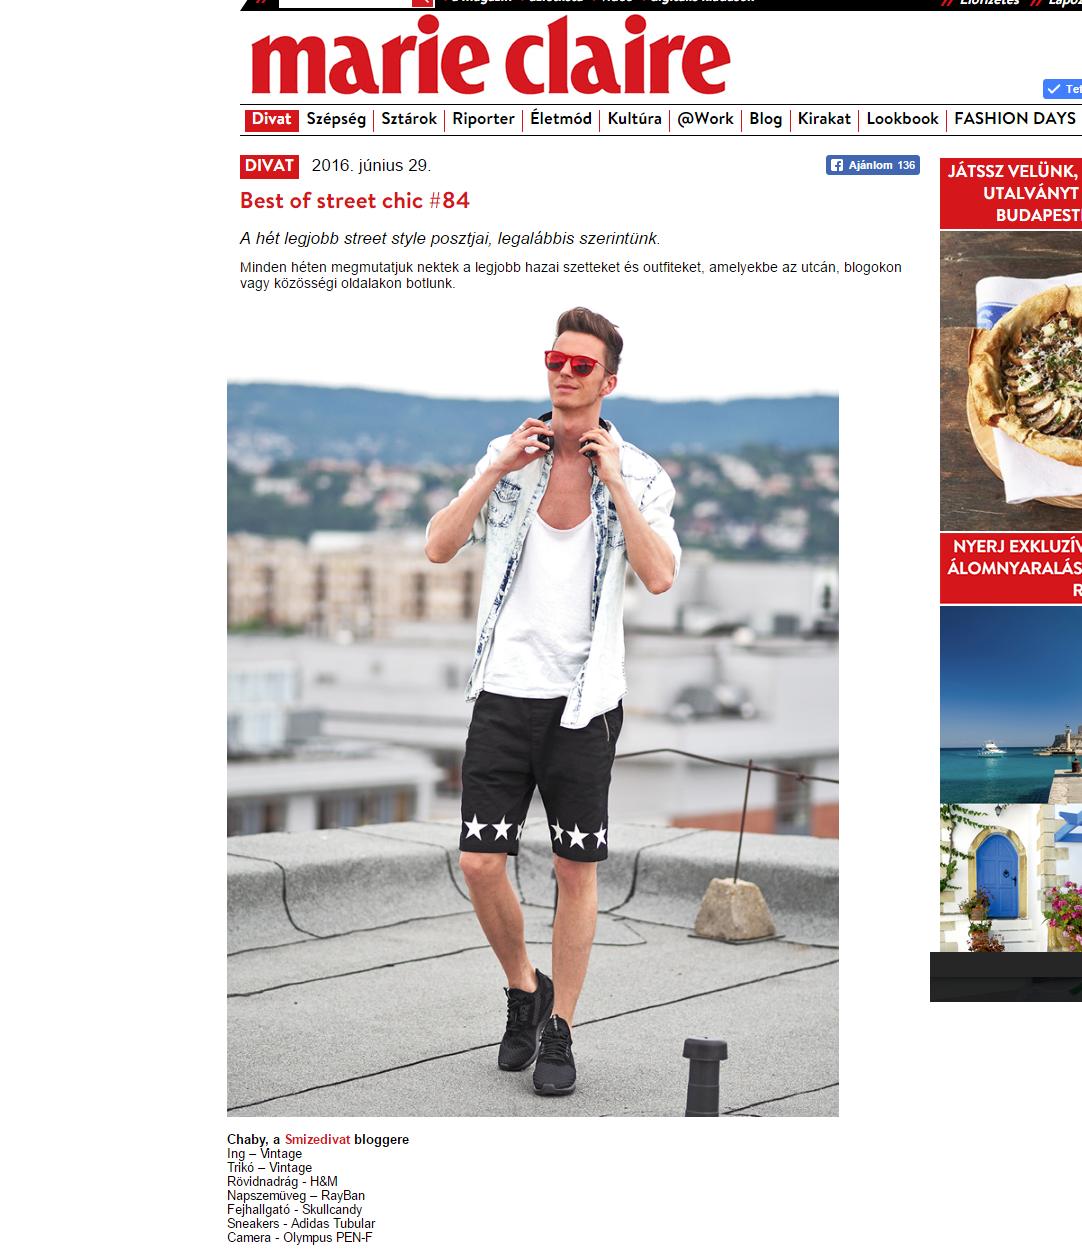 marie-claire-street-chic-smizedivat-ferfidivat-divatblogger-chaby-fiu-blog-divat-street-style.png